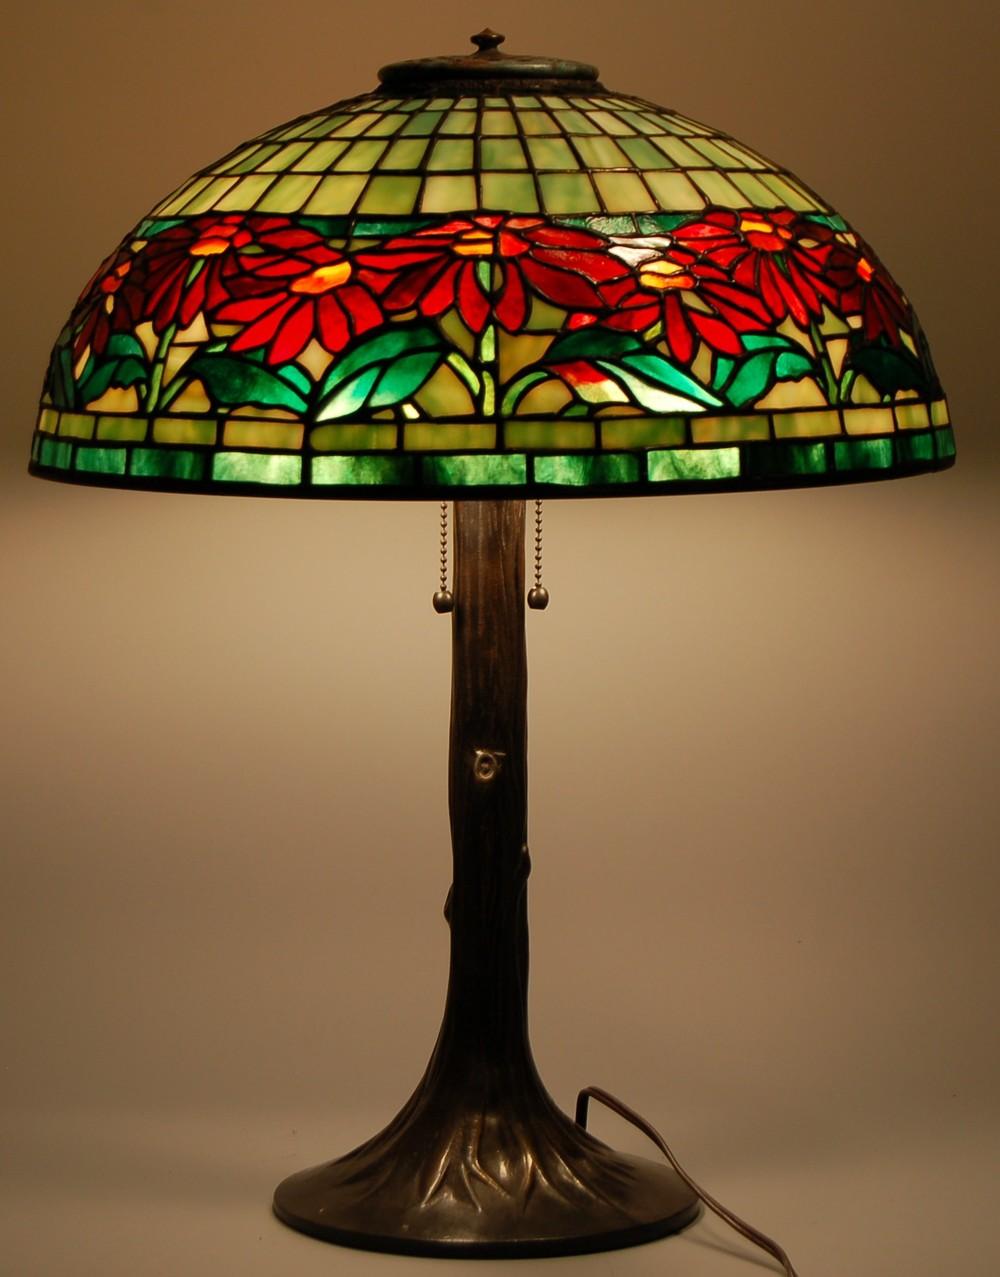 tiffany lamps jeani simmons 16 inch poinsettia.jpg TGLPSDW